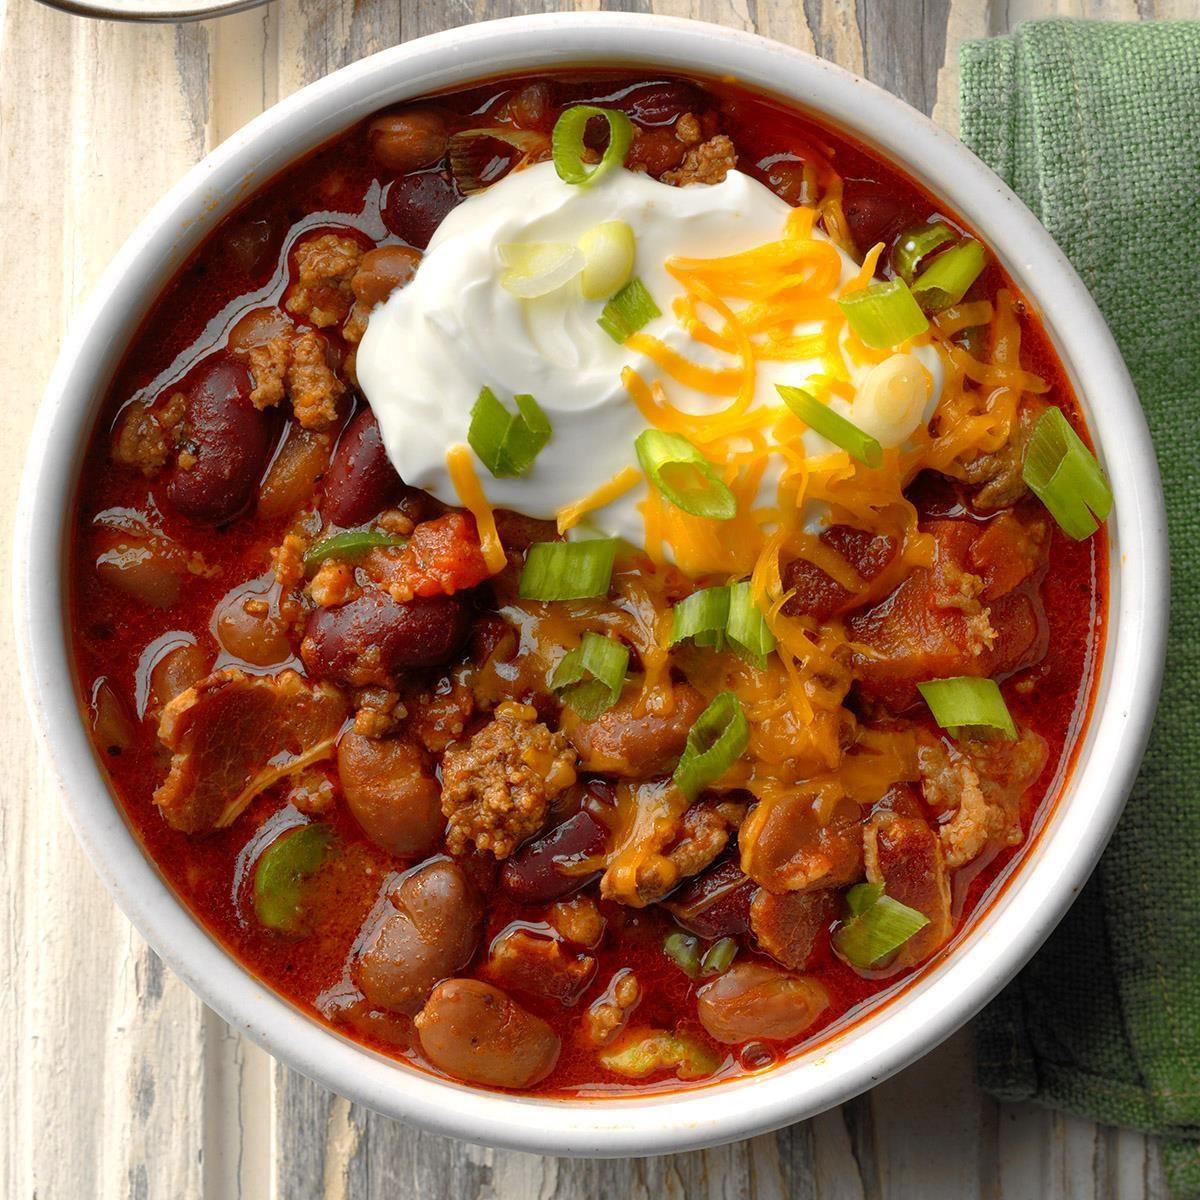 Spicy Touchdown Chili Recipe